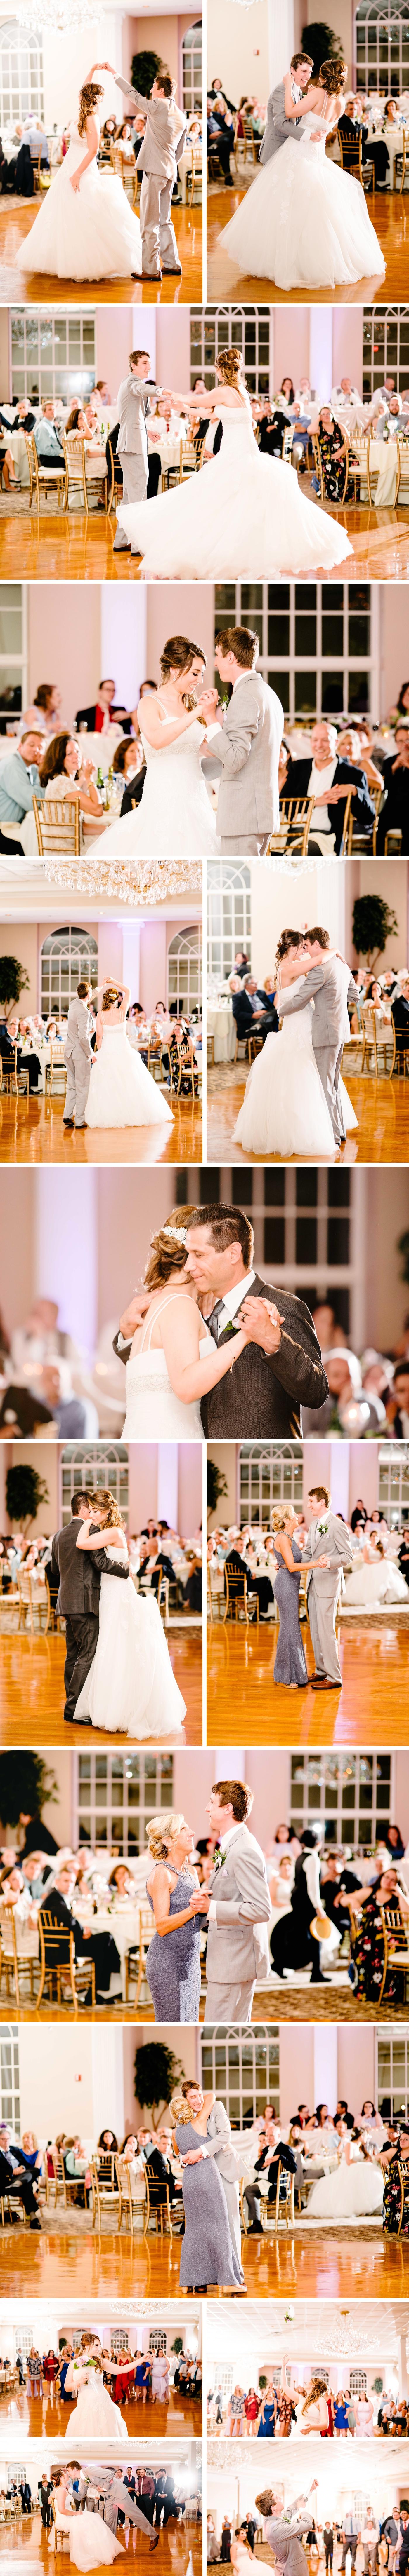 chicago-fine-art-wedding-photography-iwinski12